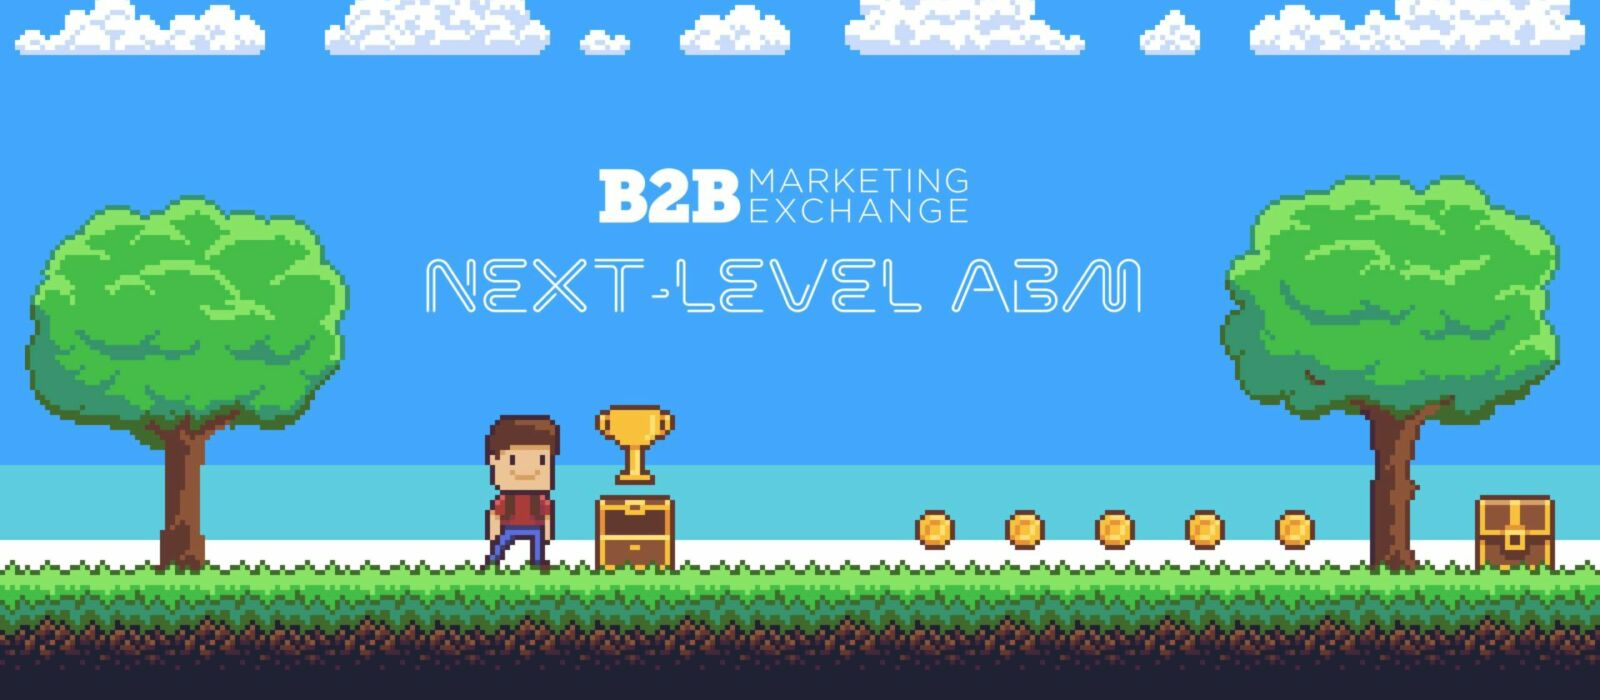 b2bmx21-nla-8bit-character